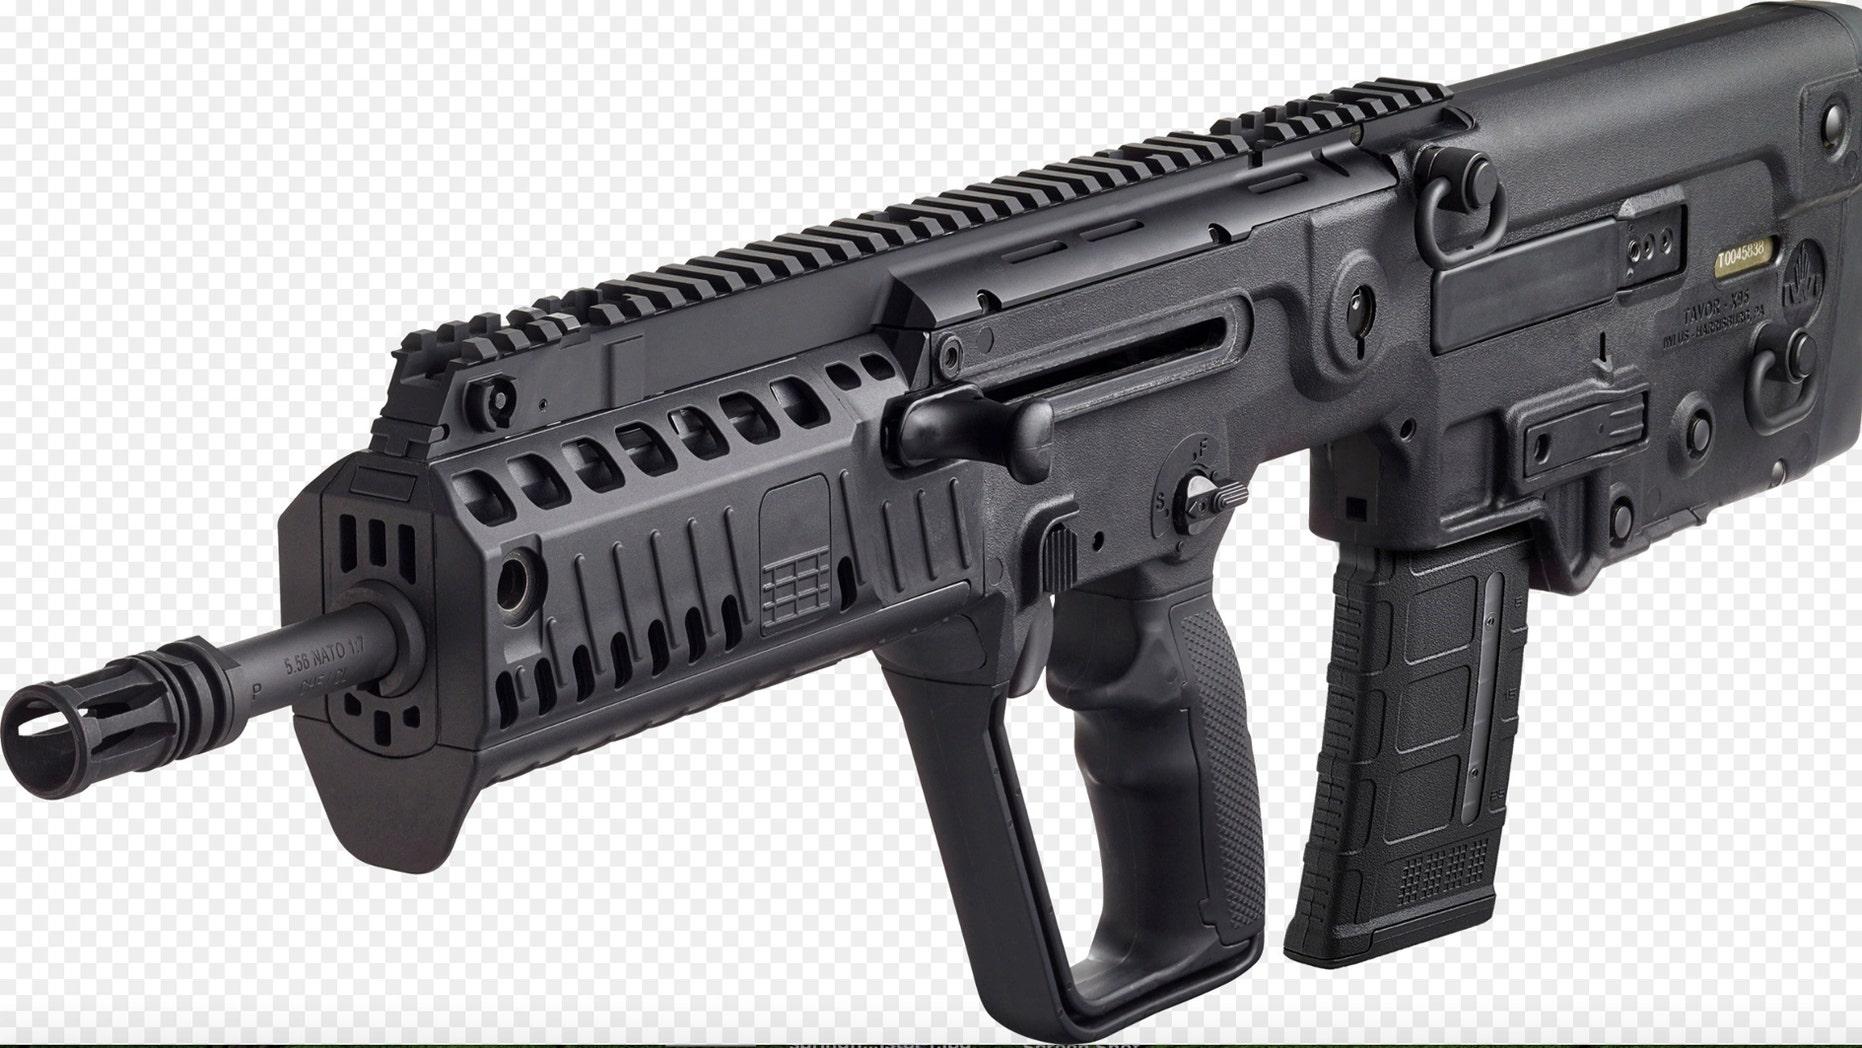 IWI Tavor TS12 Bullpup Shotgun (IWI)